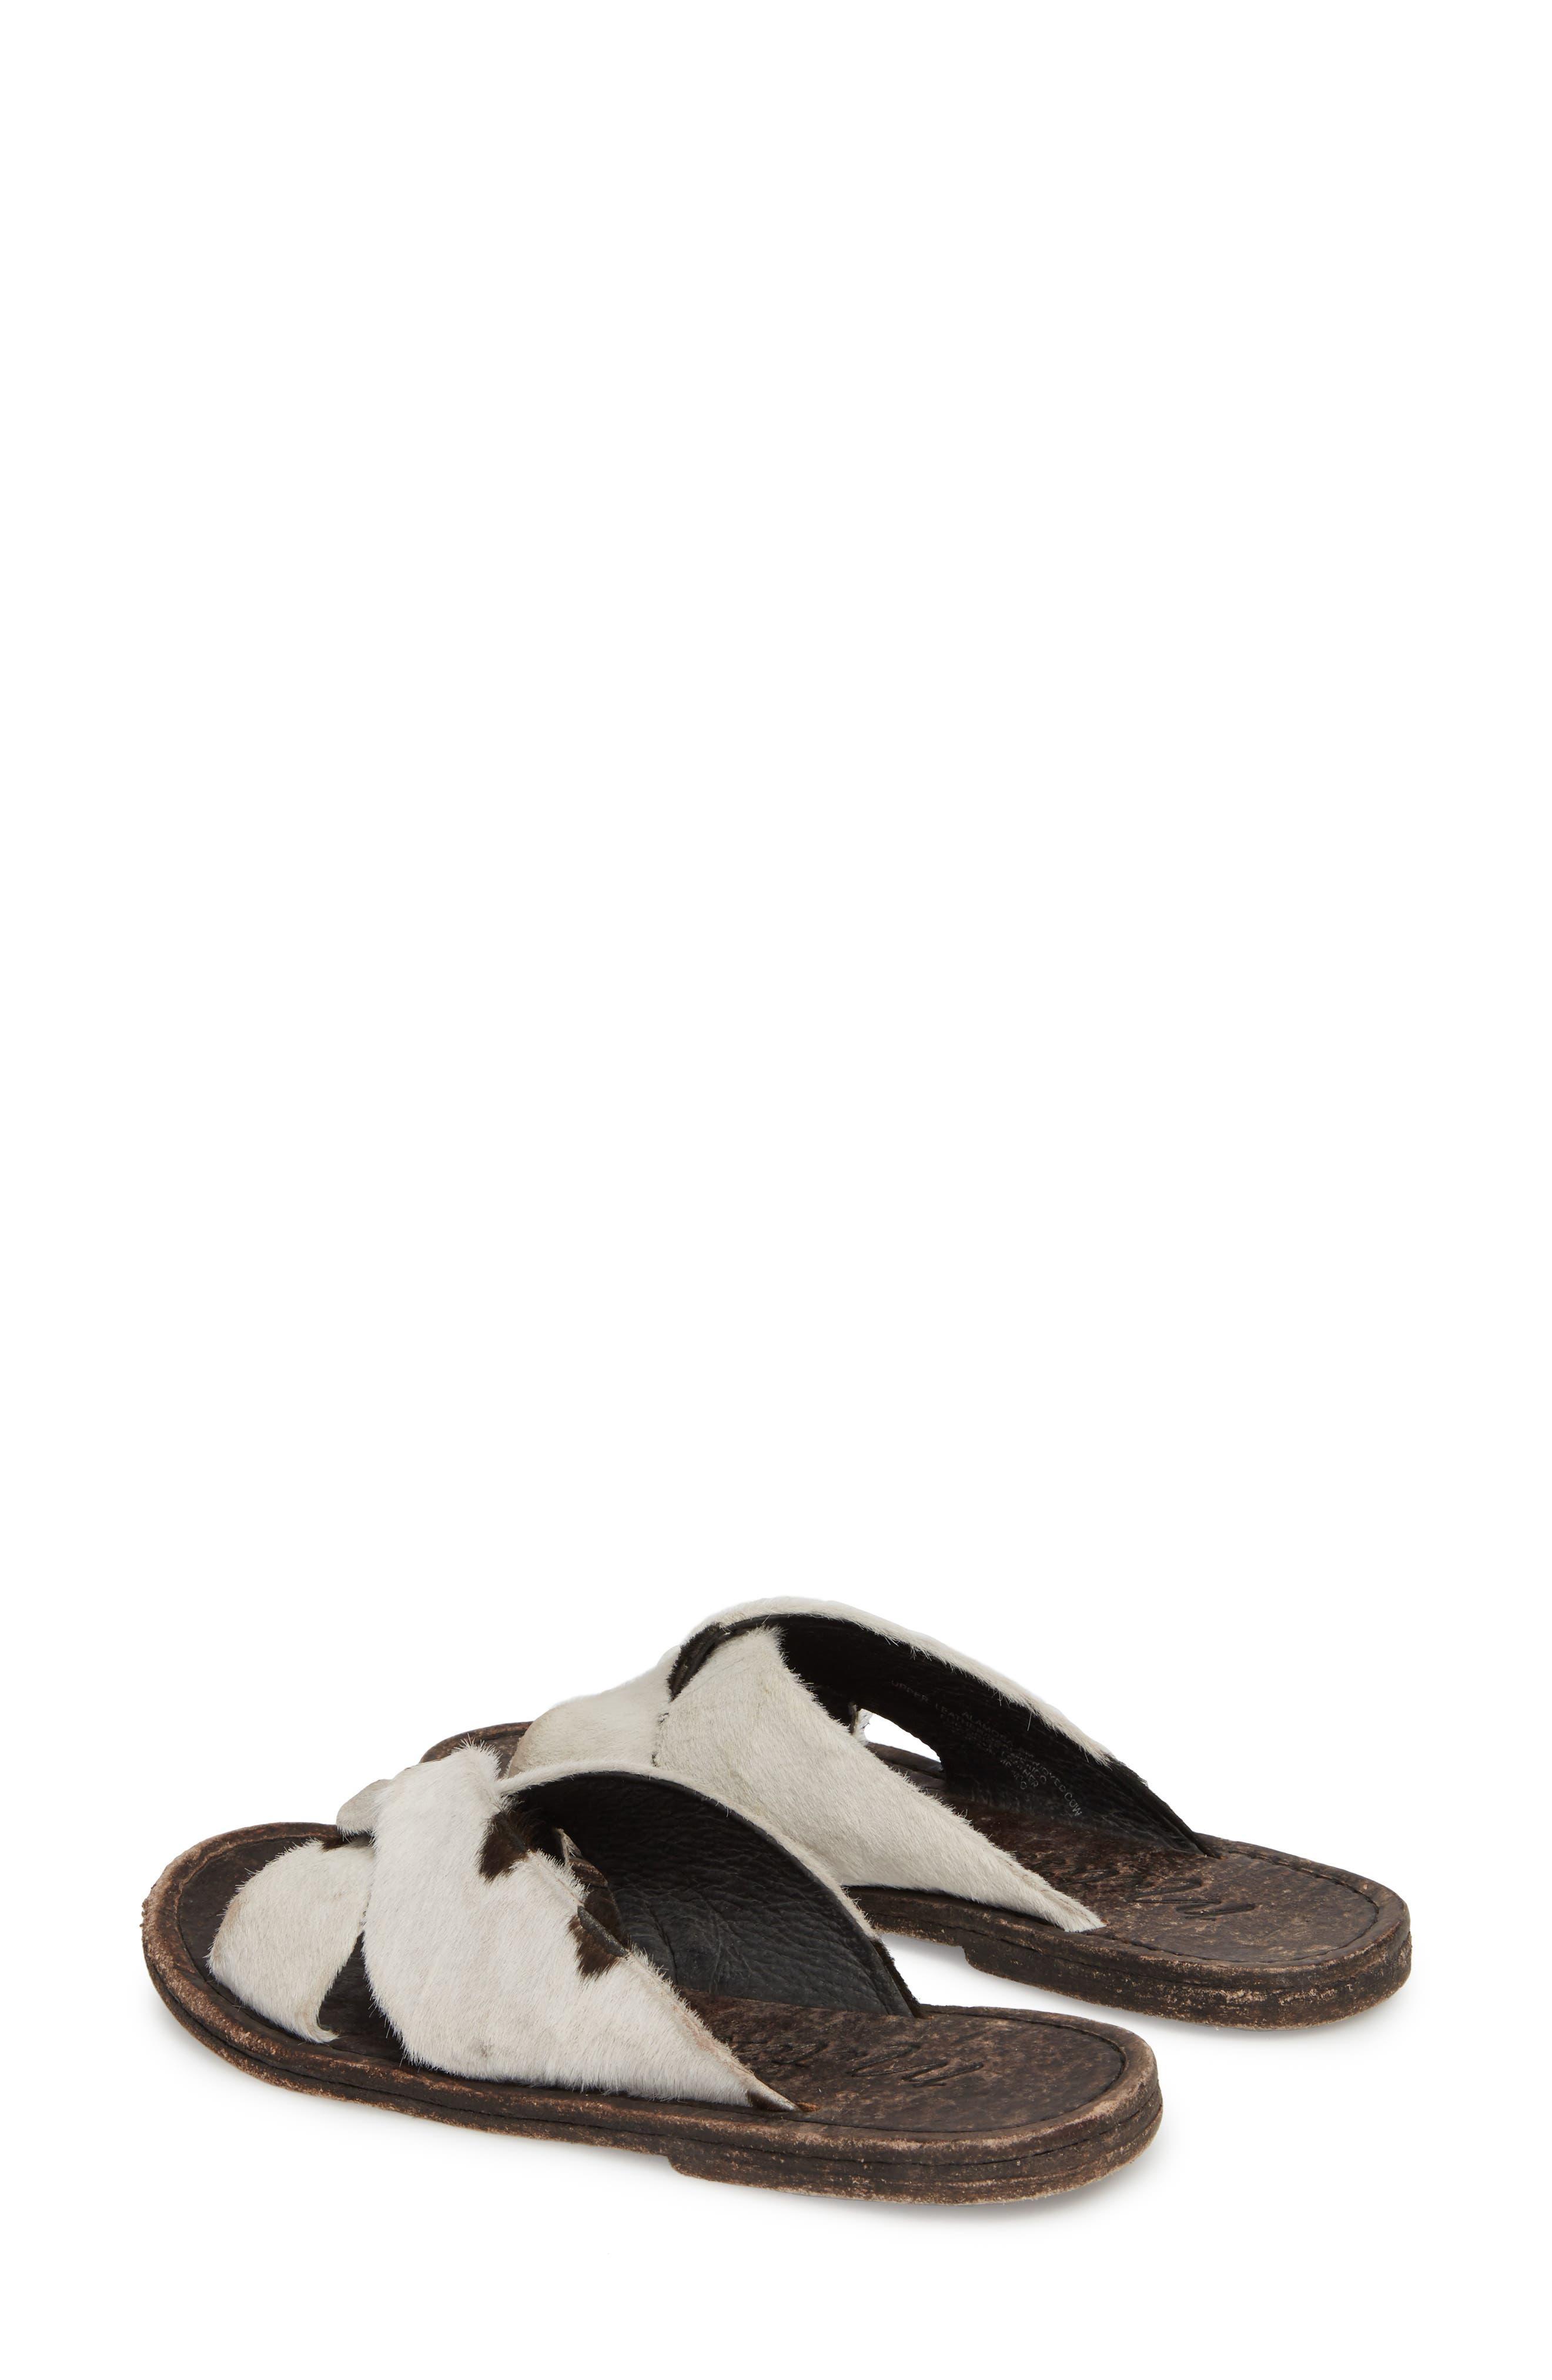 Alamosa Genuine Calf Hair Sandal,                             Alternate thumbnail 2, color,                             Black/ White